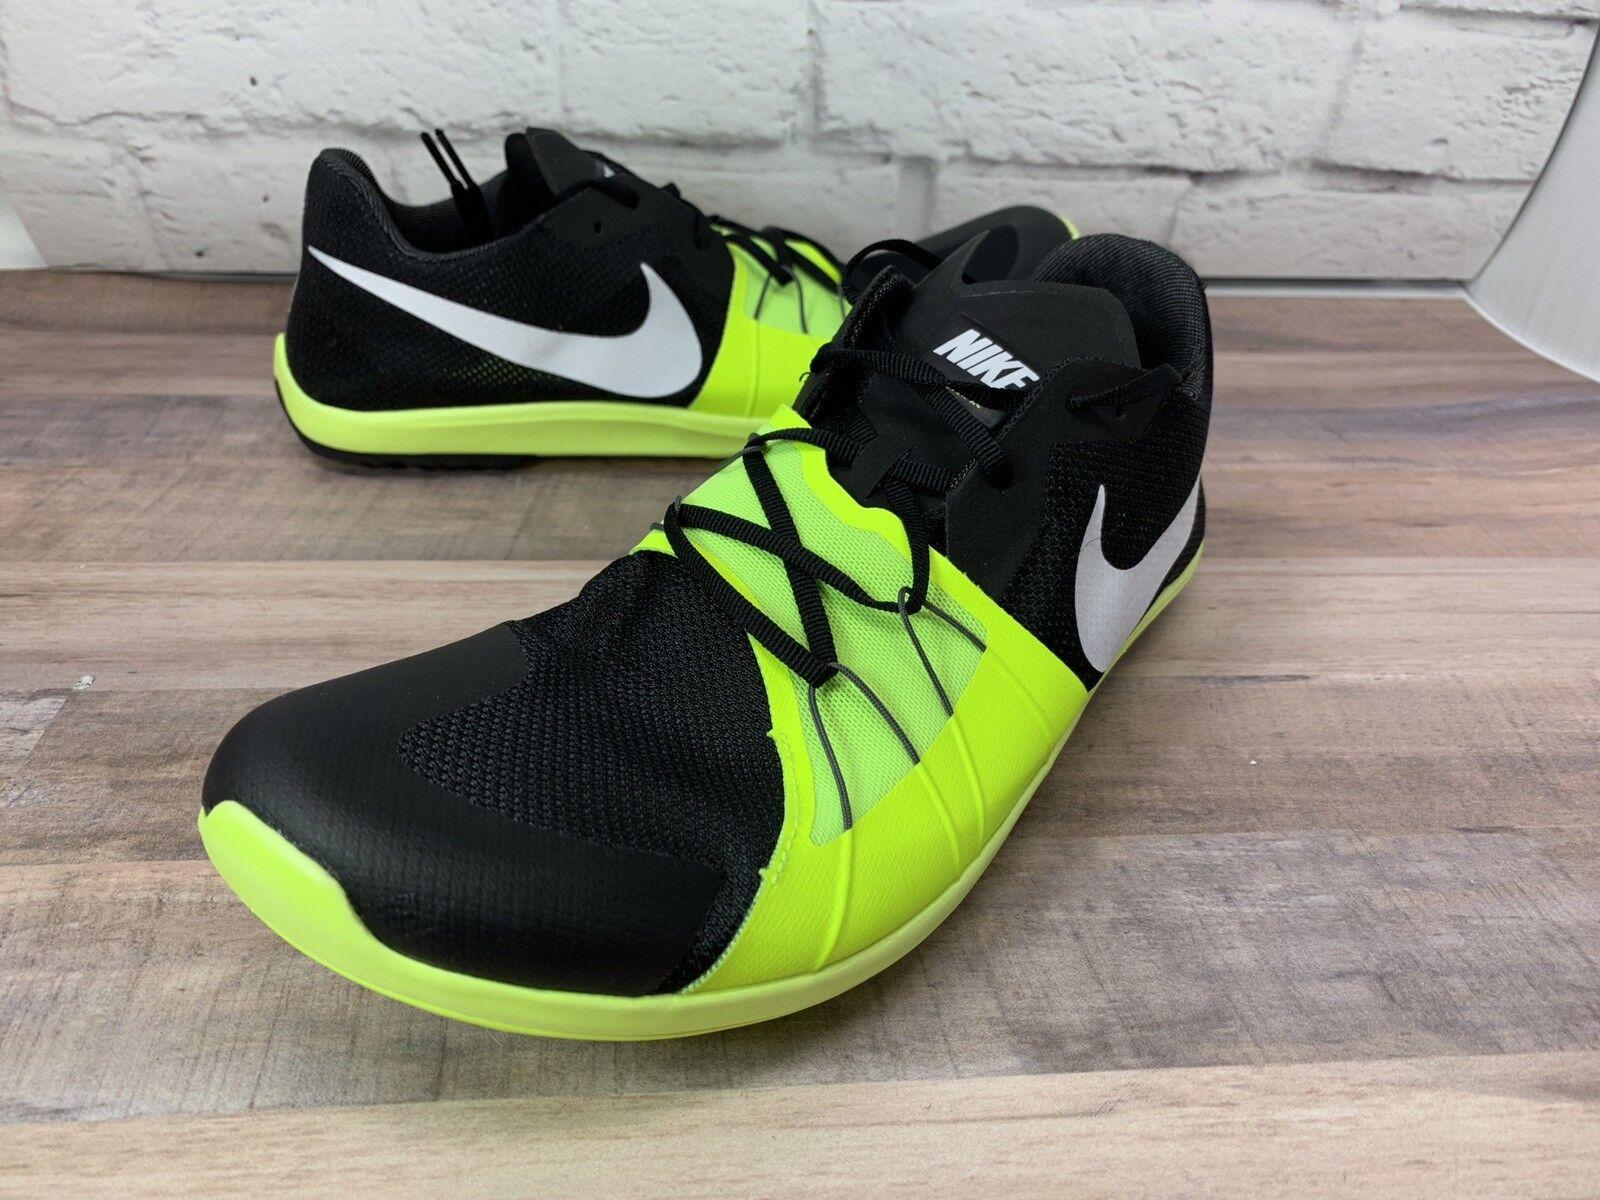 Nike zoom ewig xc 5 schwarze / volt - sieg xc laufschuhe 904723-017 größe 12